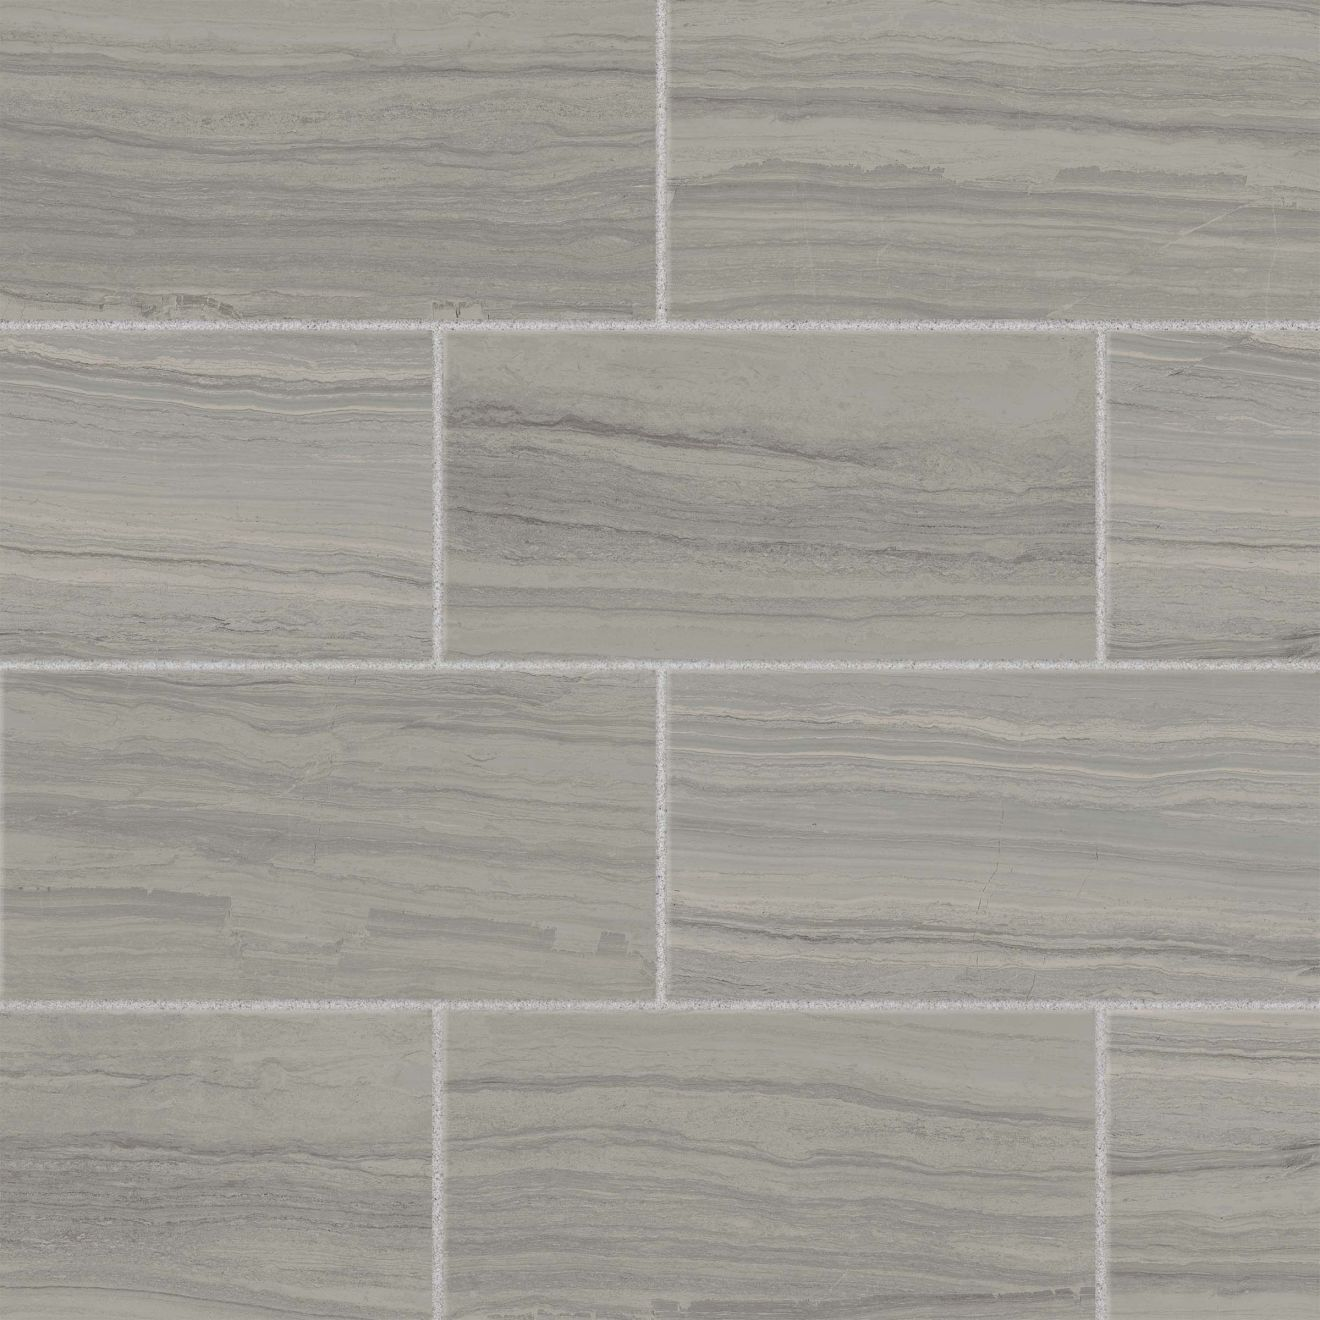 "Highland 12"" x 24"" Floor & Wall Tile in Greige"